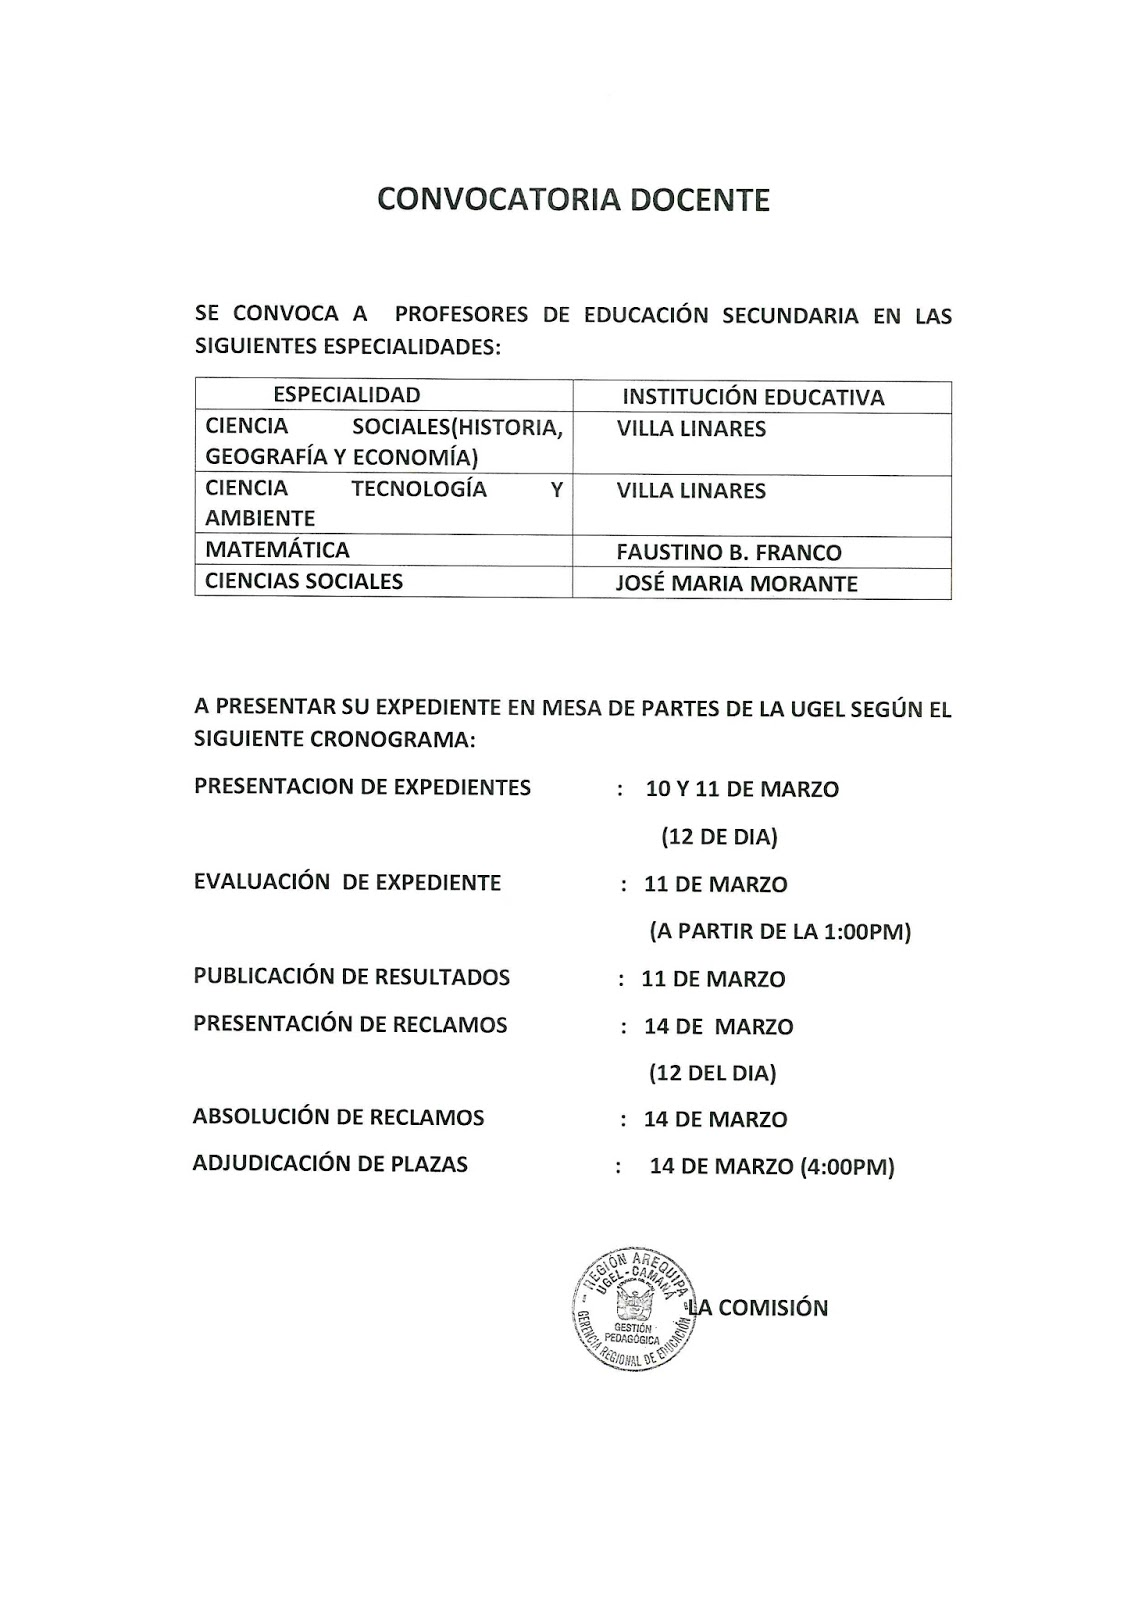 Contrato docente 2016 plazas vacantes de ciencias for Plazas vacantes concurso docente 2016